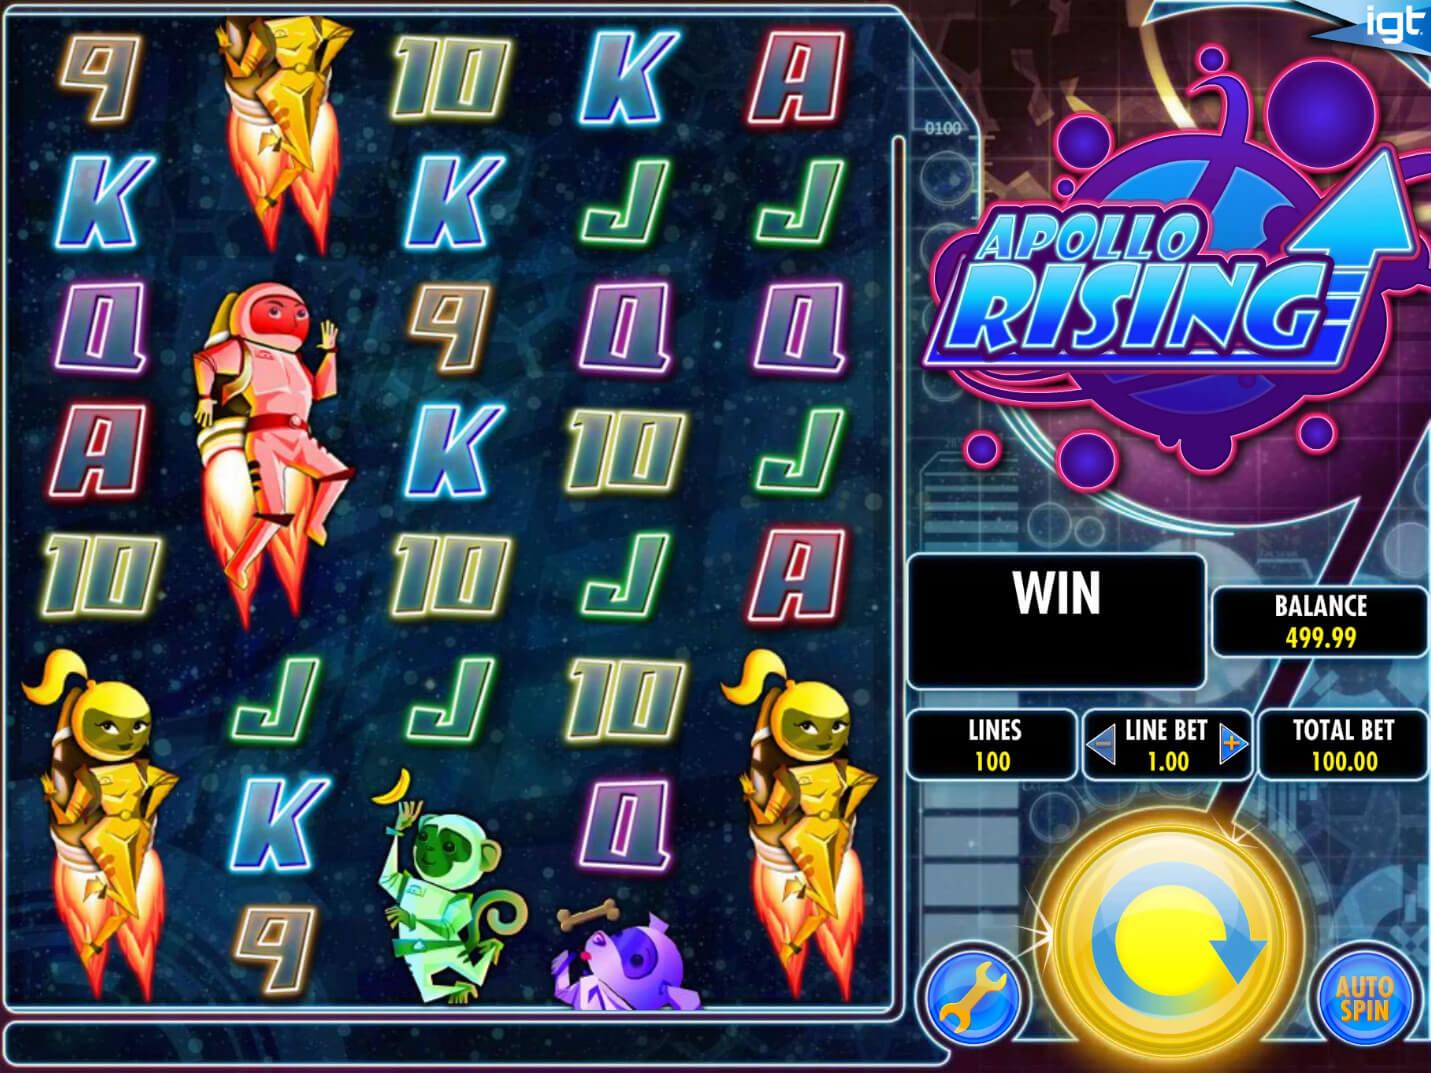 Snapshot from game: Apollo Rising